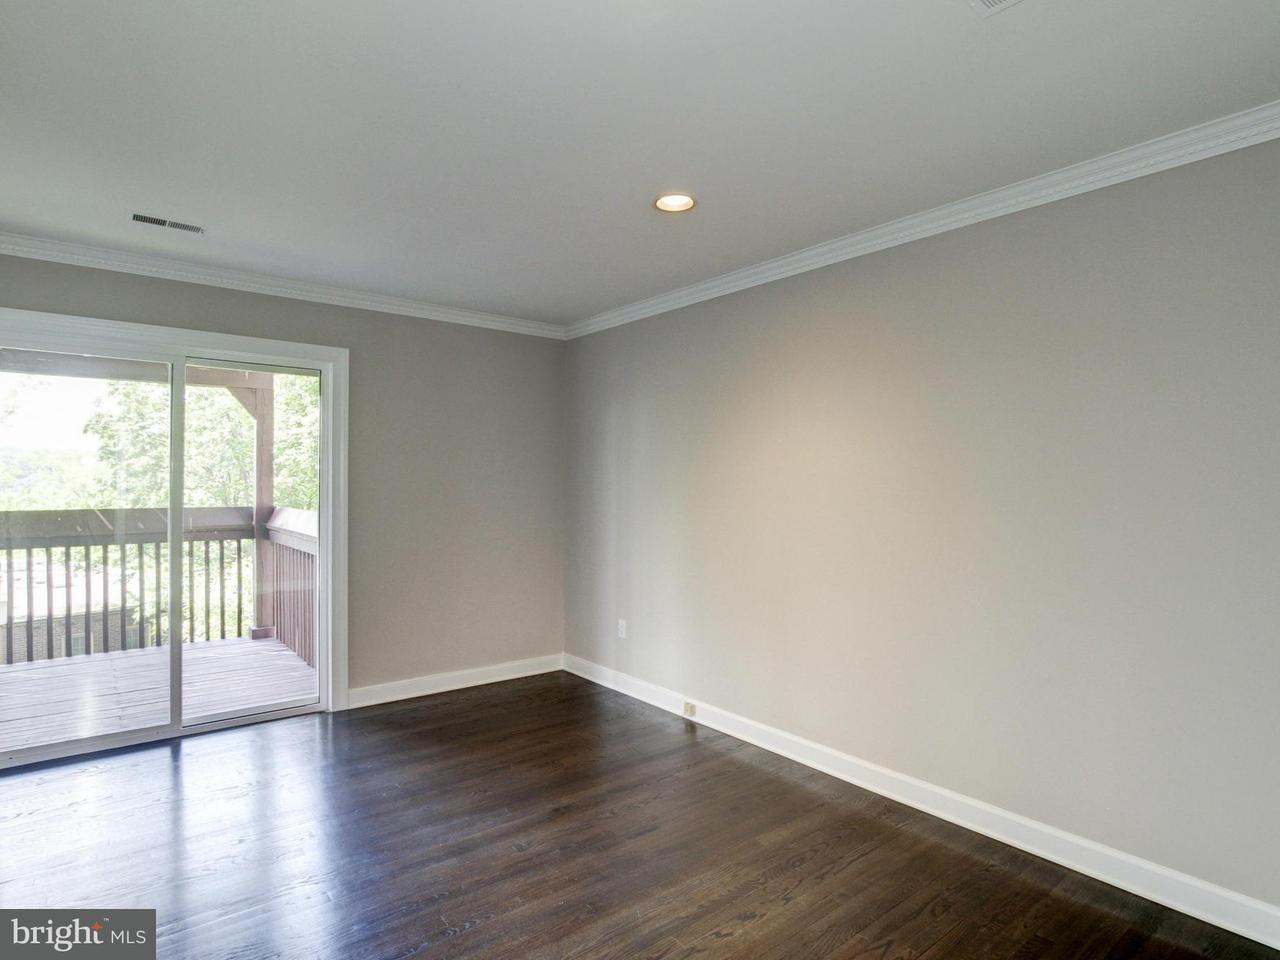 Additional photo for property listing at 4662 CHARLESTON TER NW 4662 CHARLESTON TER NW Washington, 컬럼비아주 20007 미국